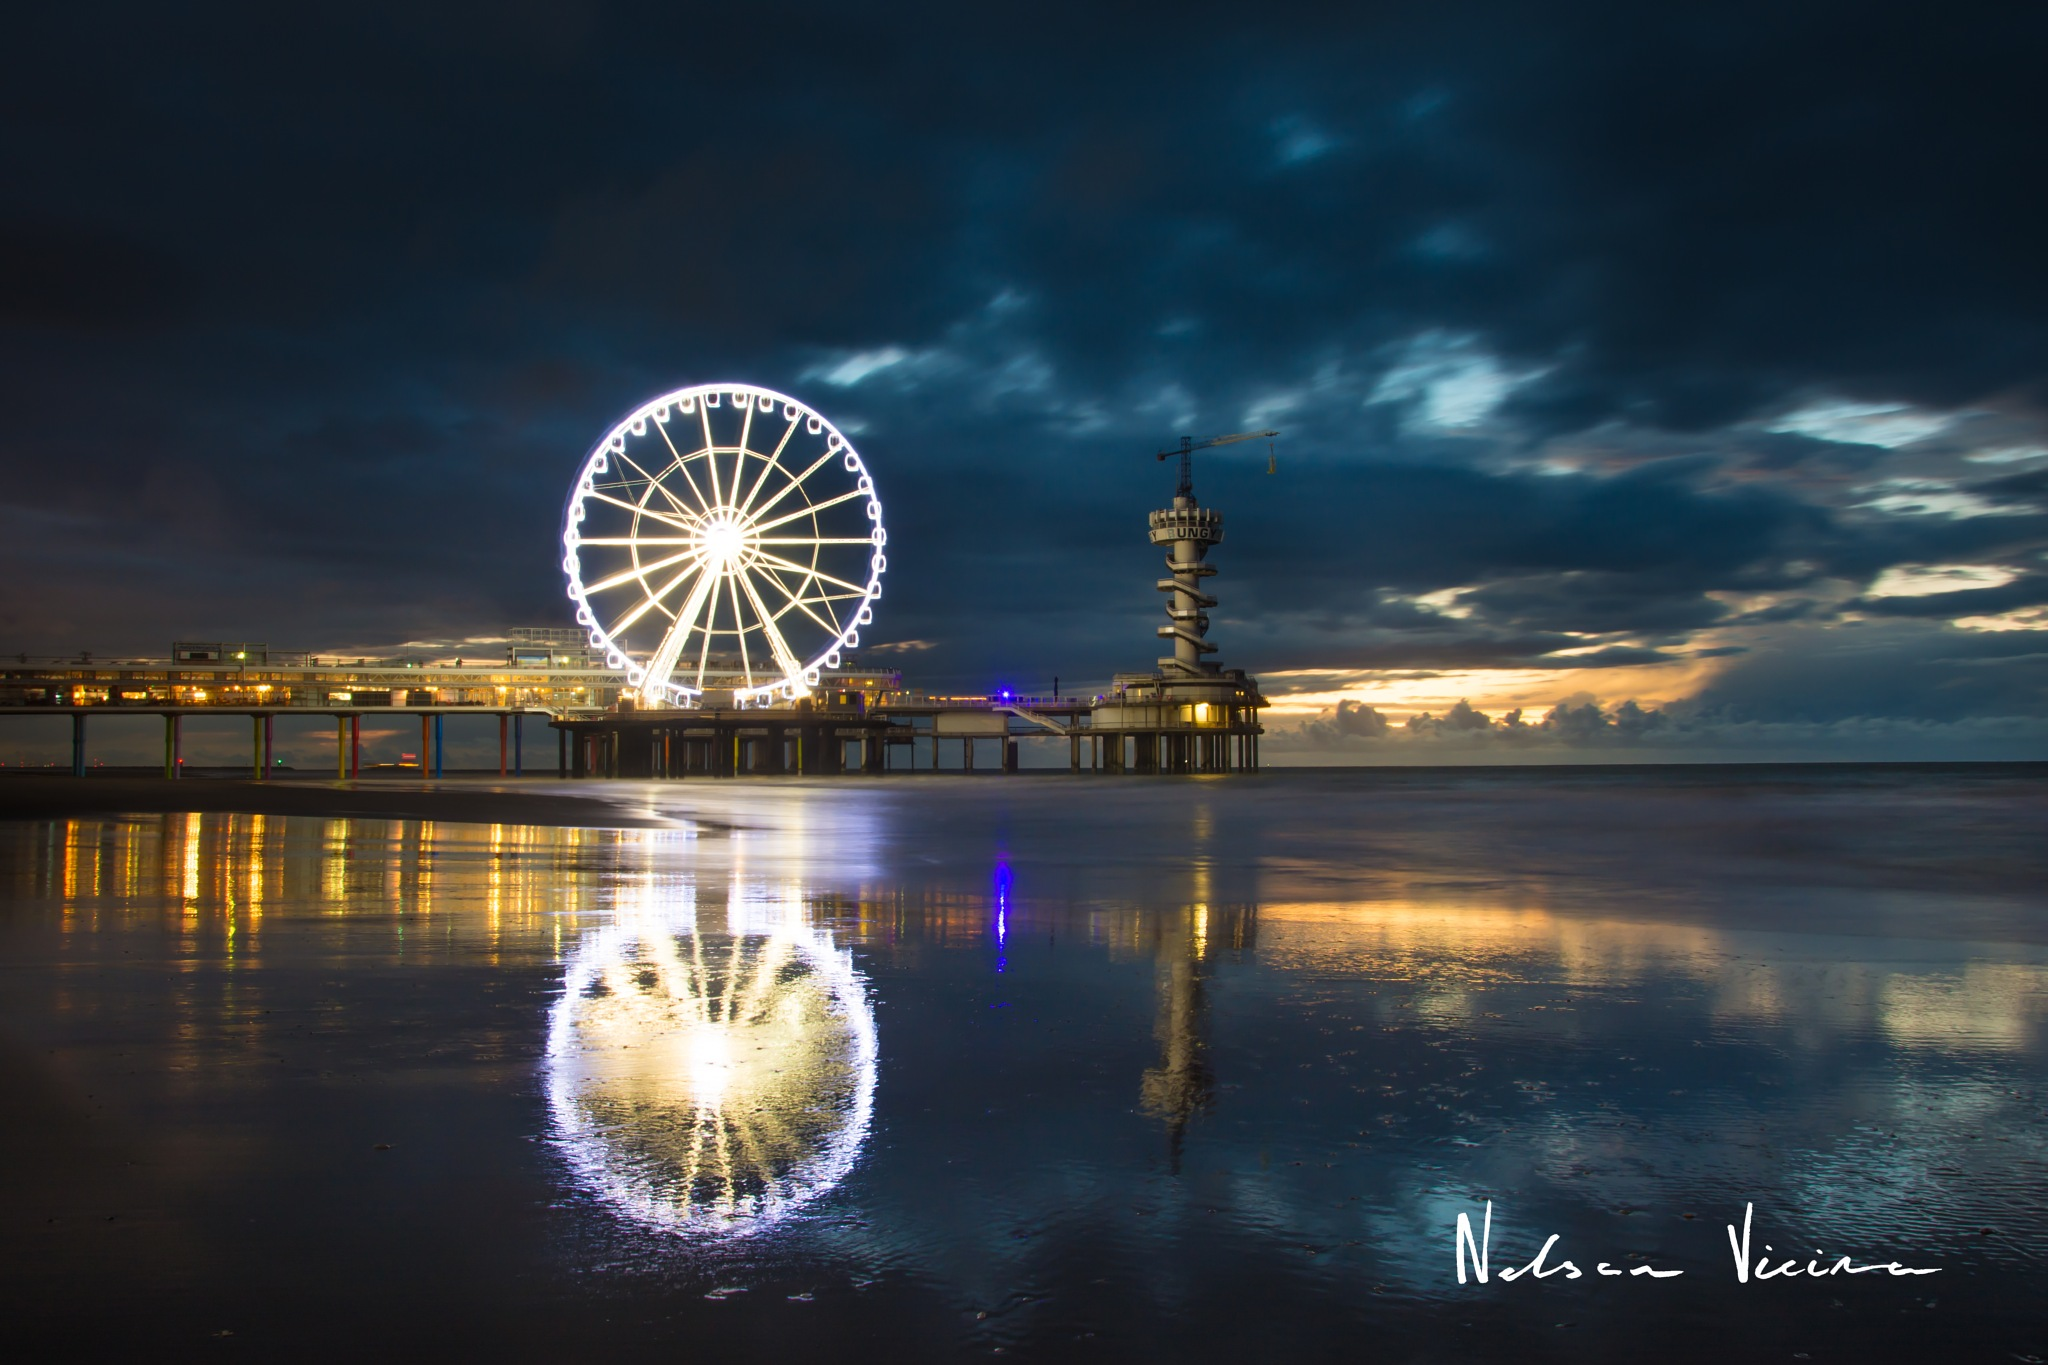 Powerful sky by Nelson Vieira